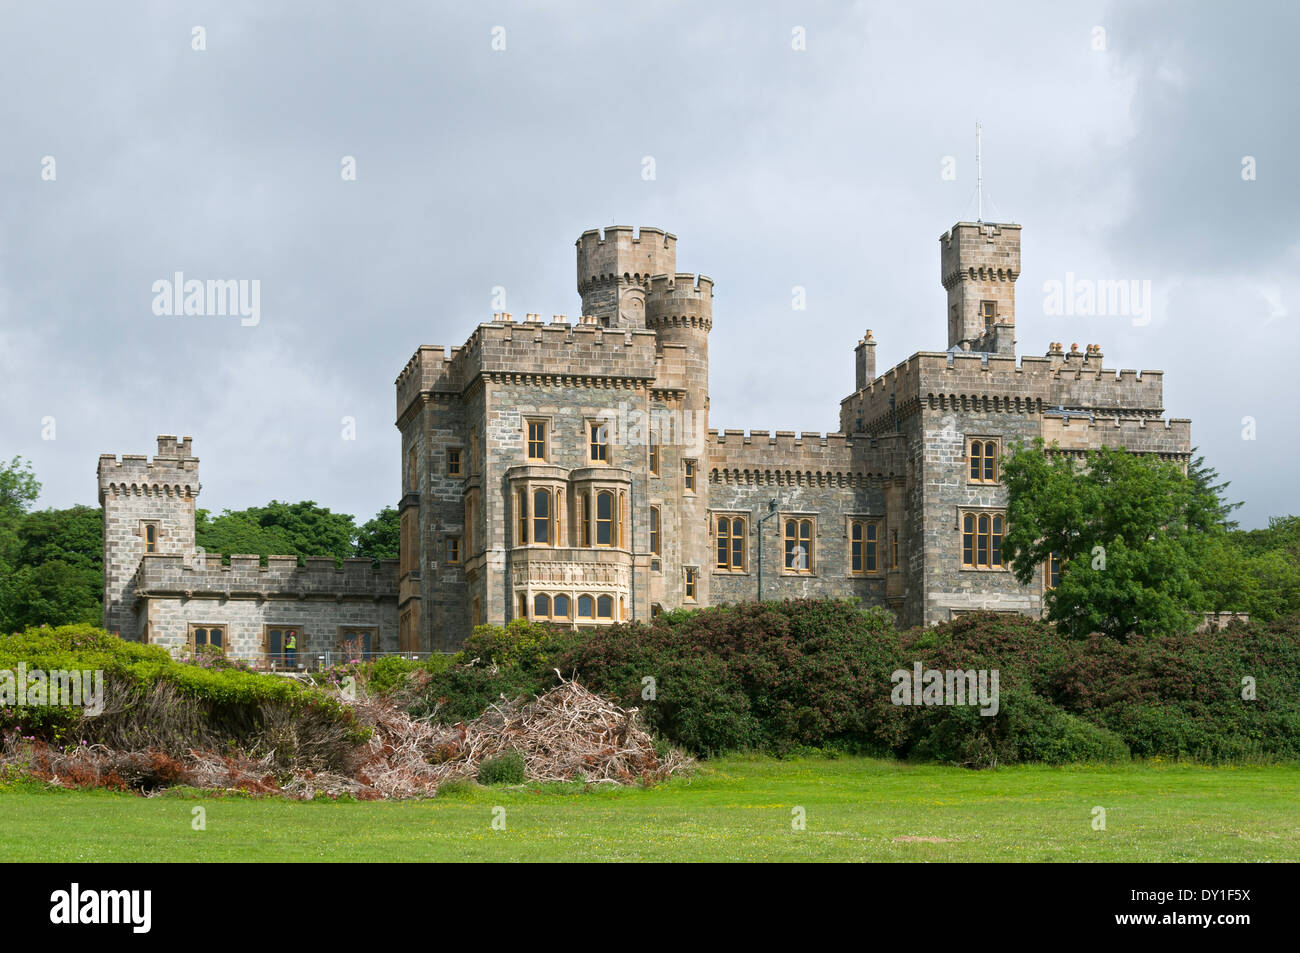 Lews Castle, Stornoway, Isle of Lewis, Western Isles, Scotland, UK - Stock Image